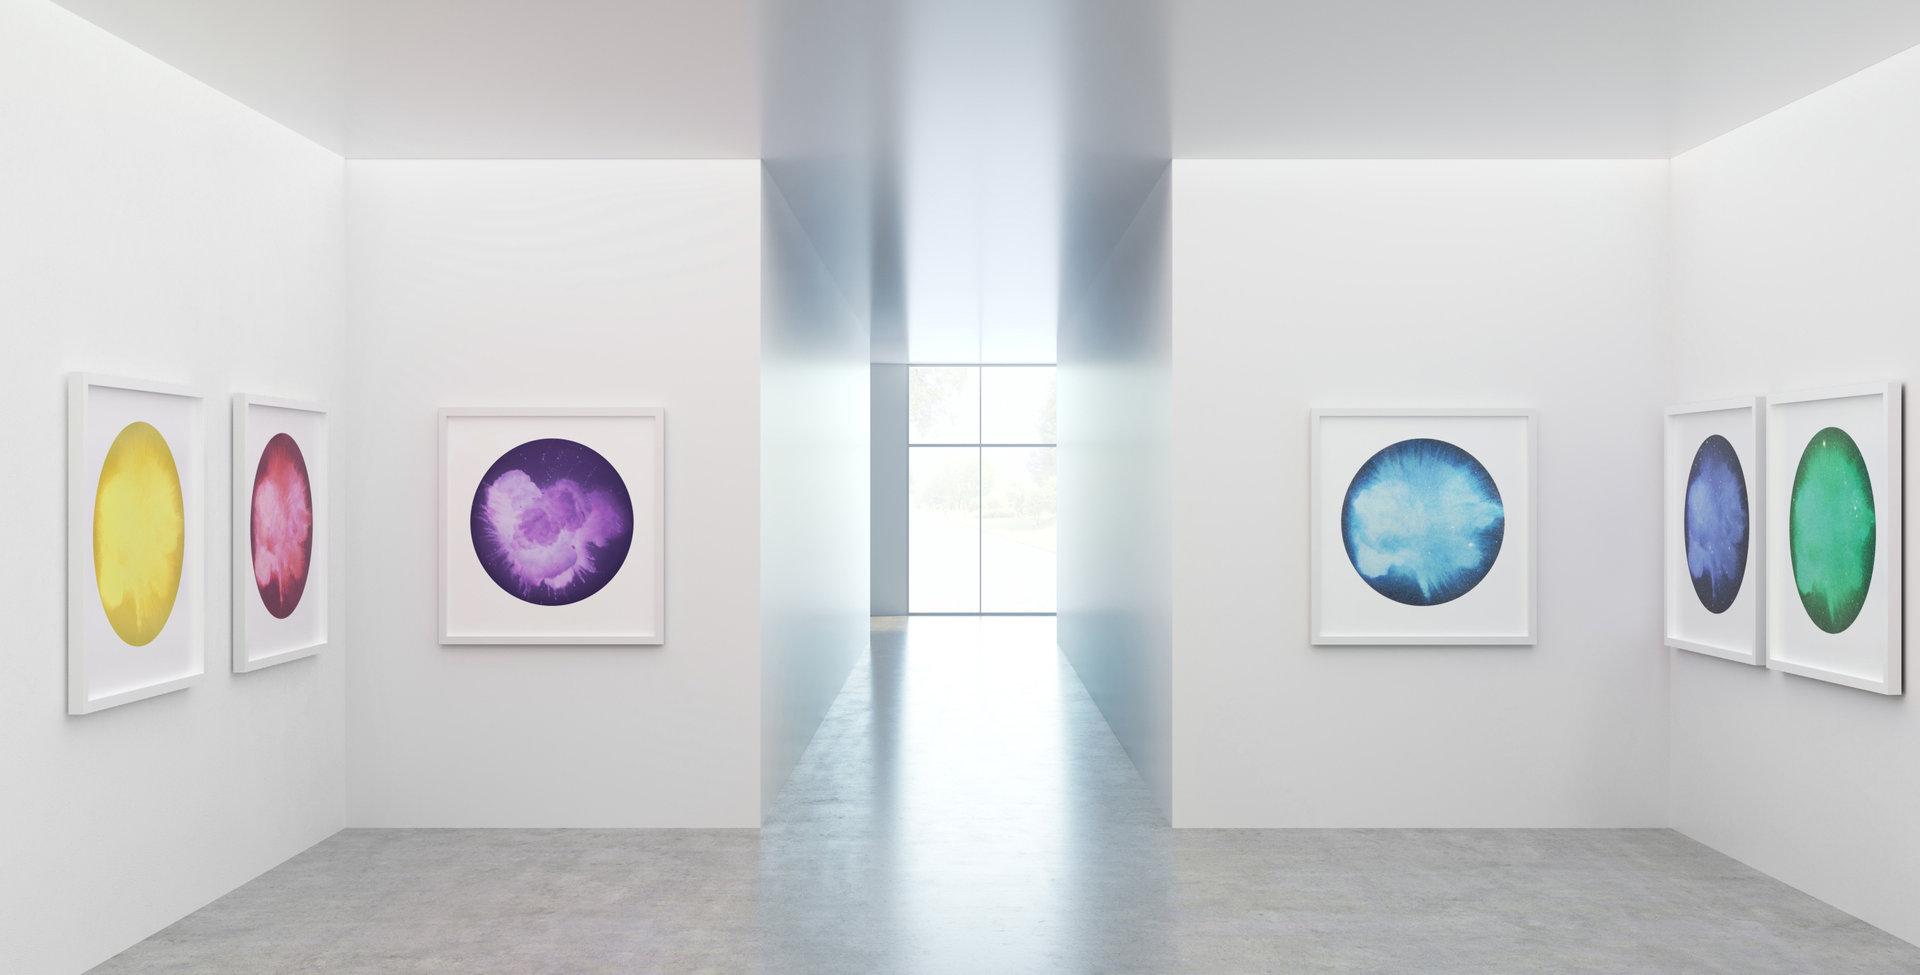 Christian Furr gallery